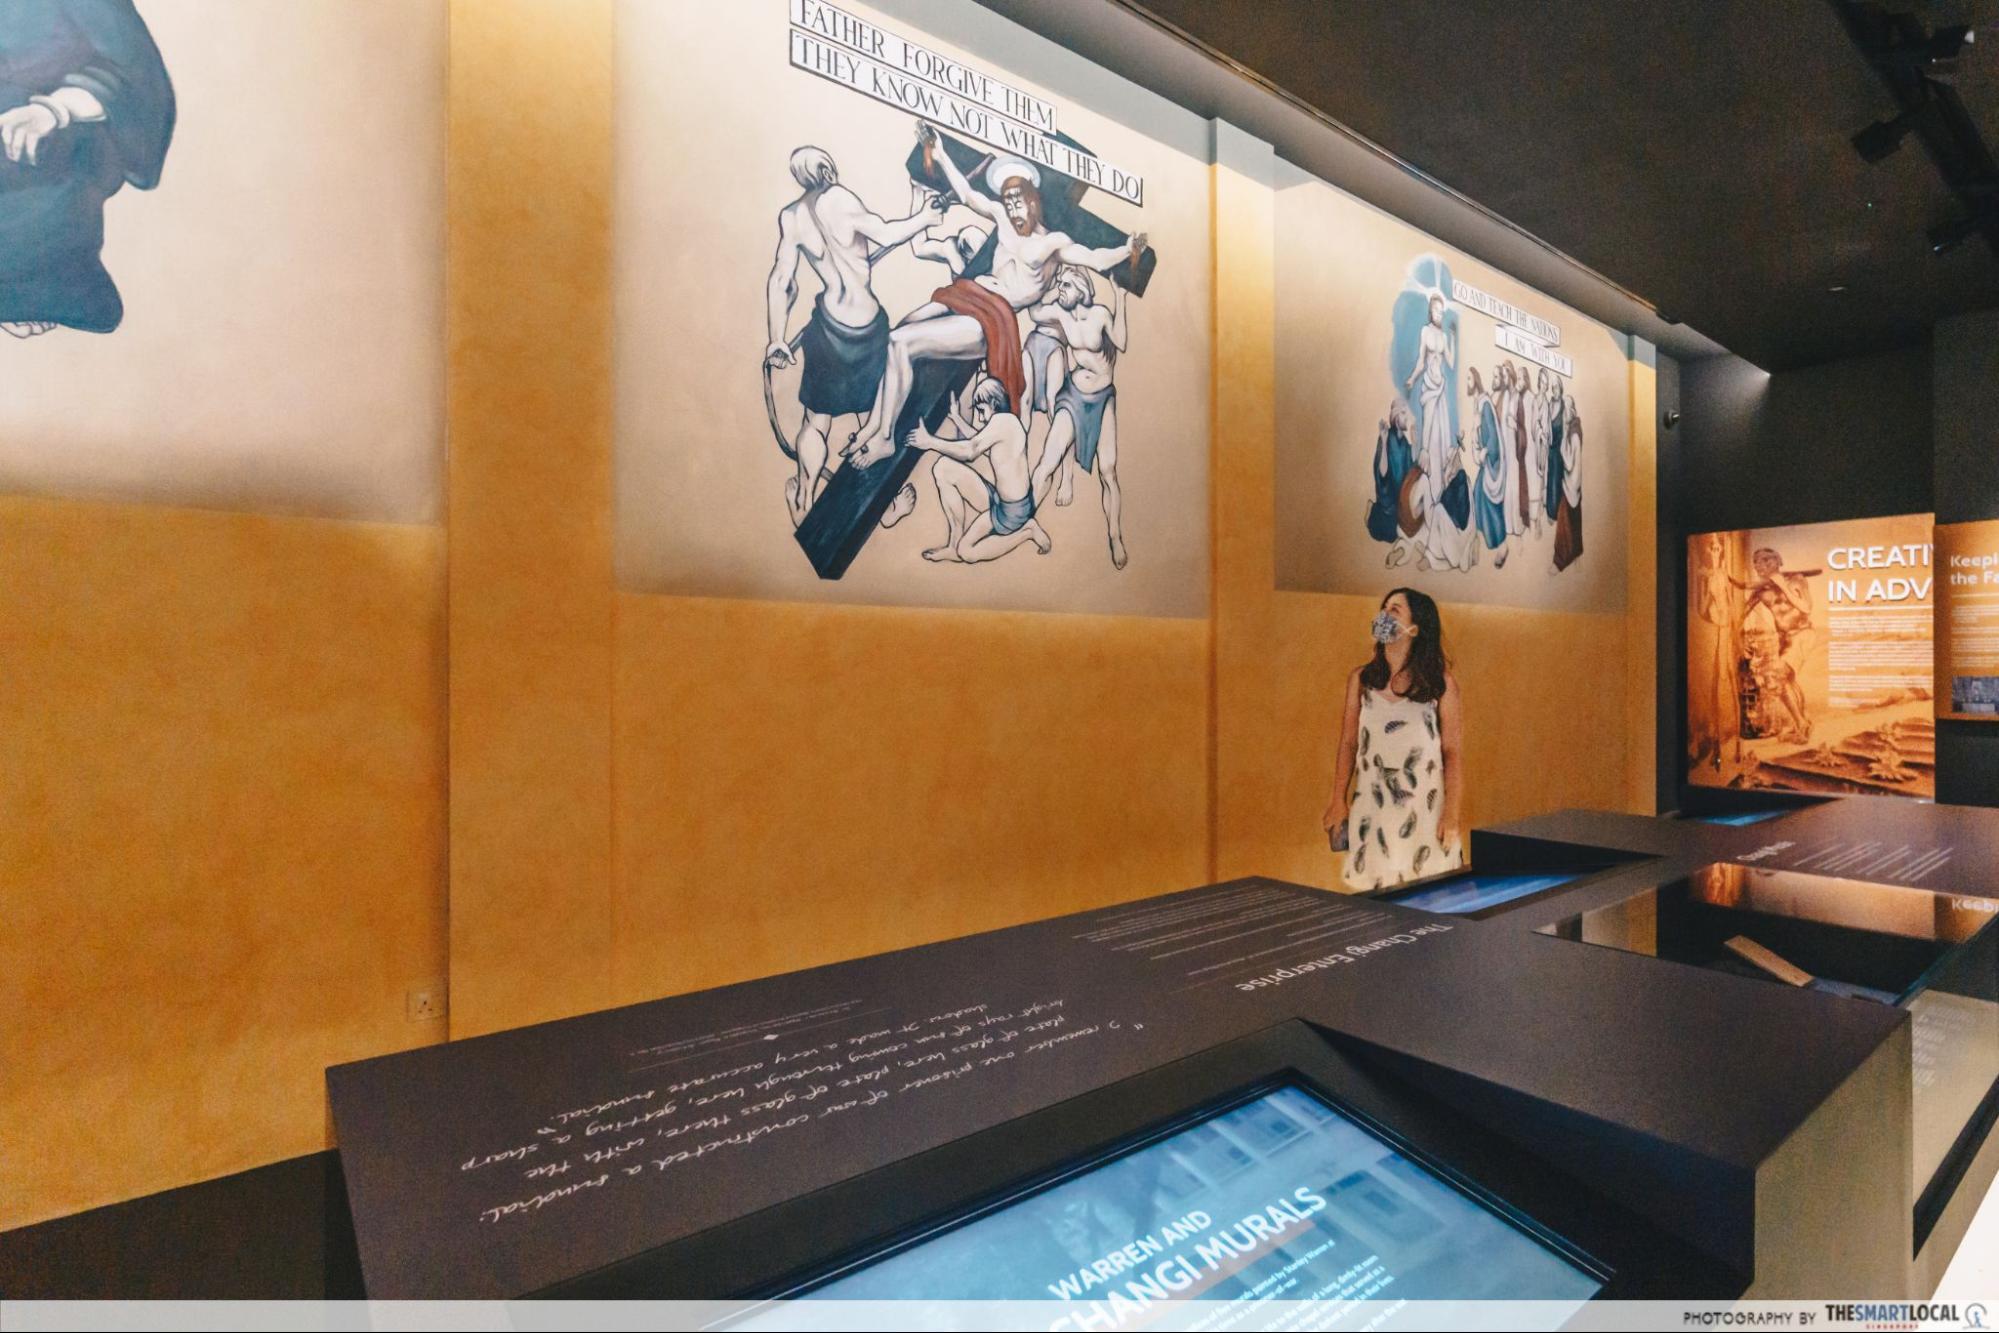 Changi Chapel and museum replica murals